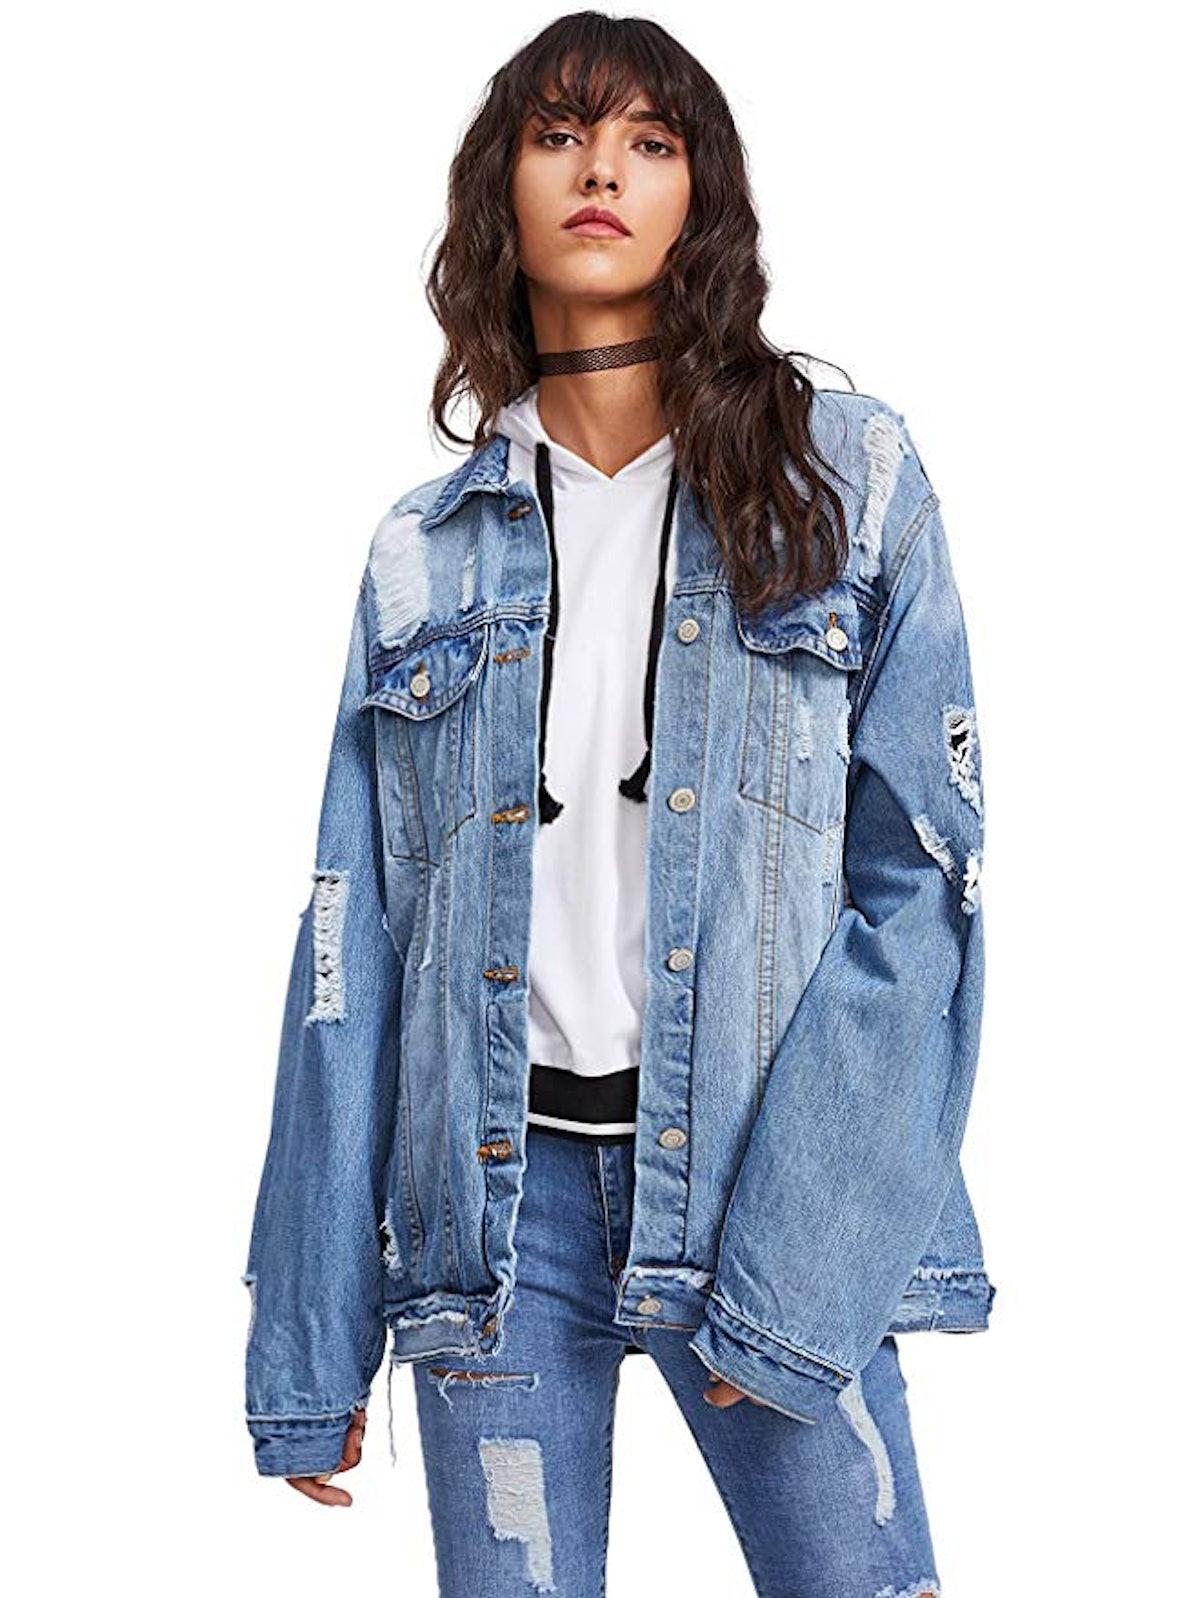 Floerns Women's Ripped Long Sleeve Denim Jacket